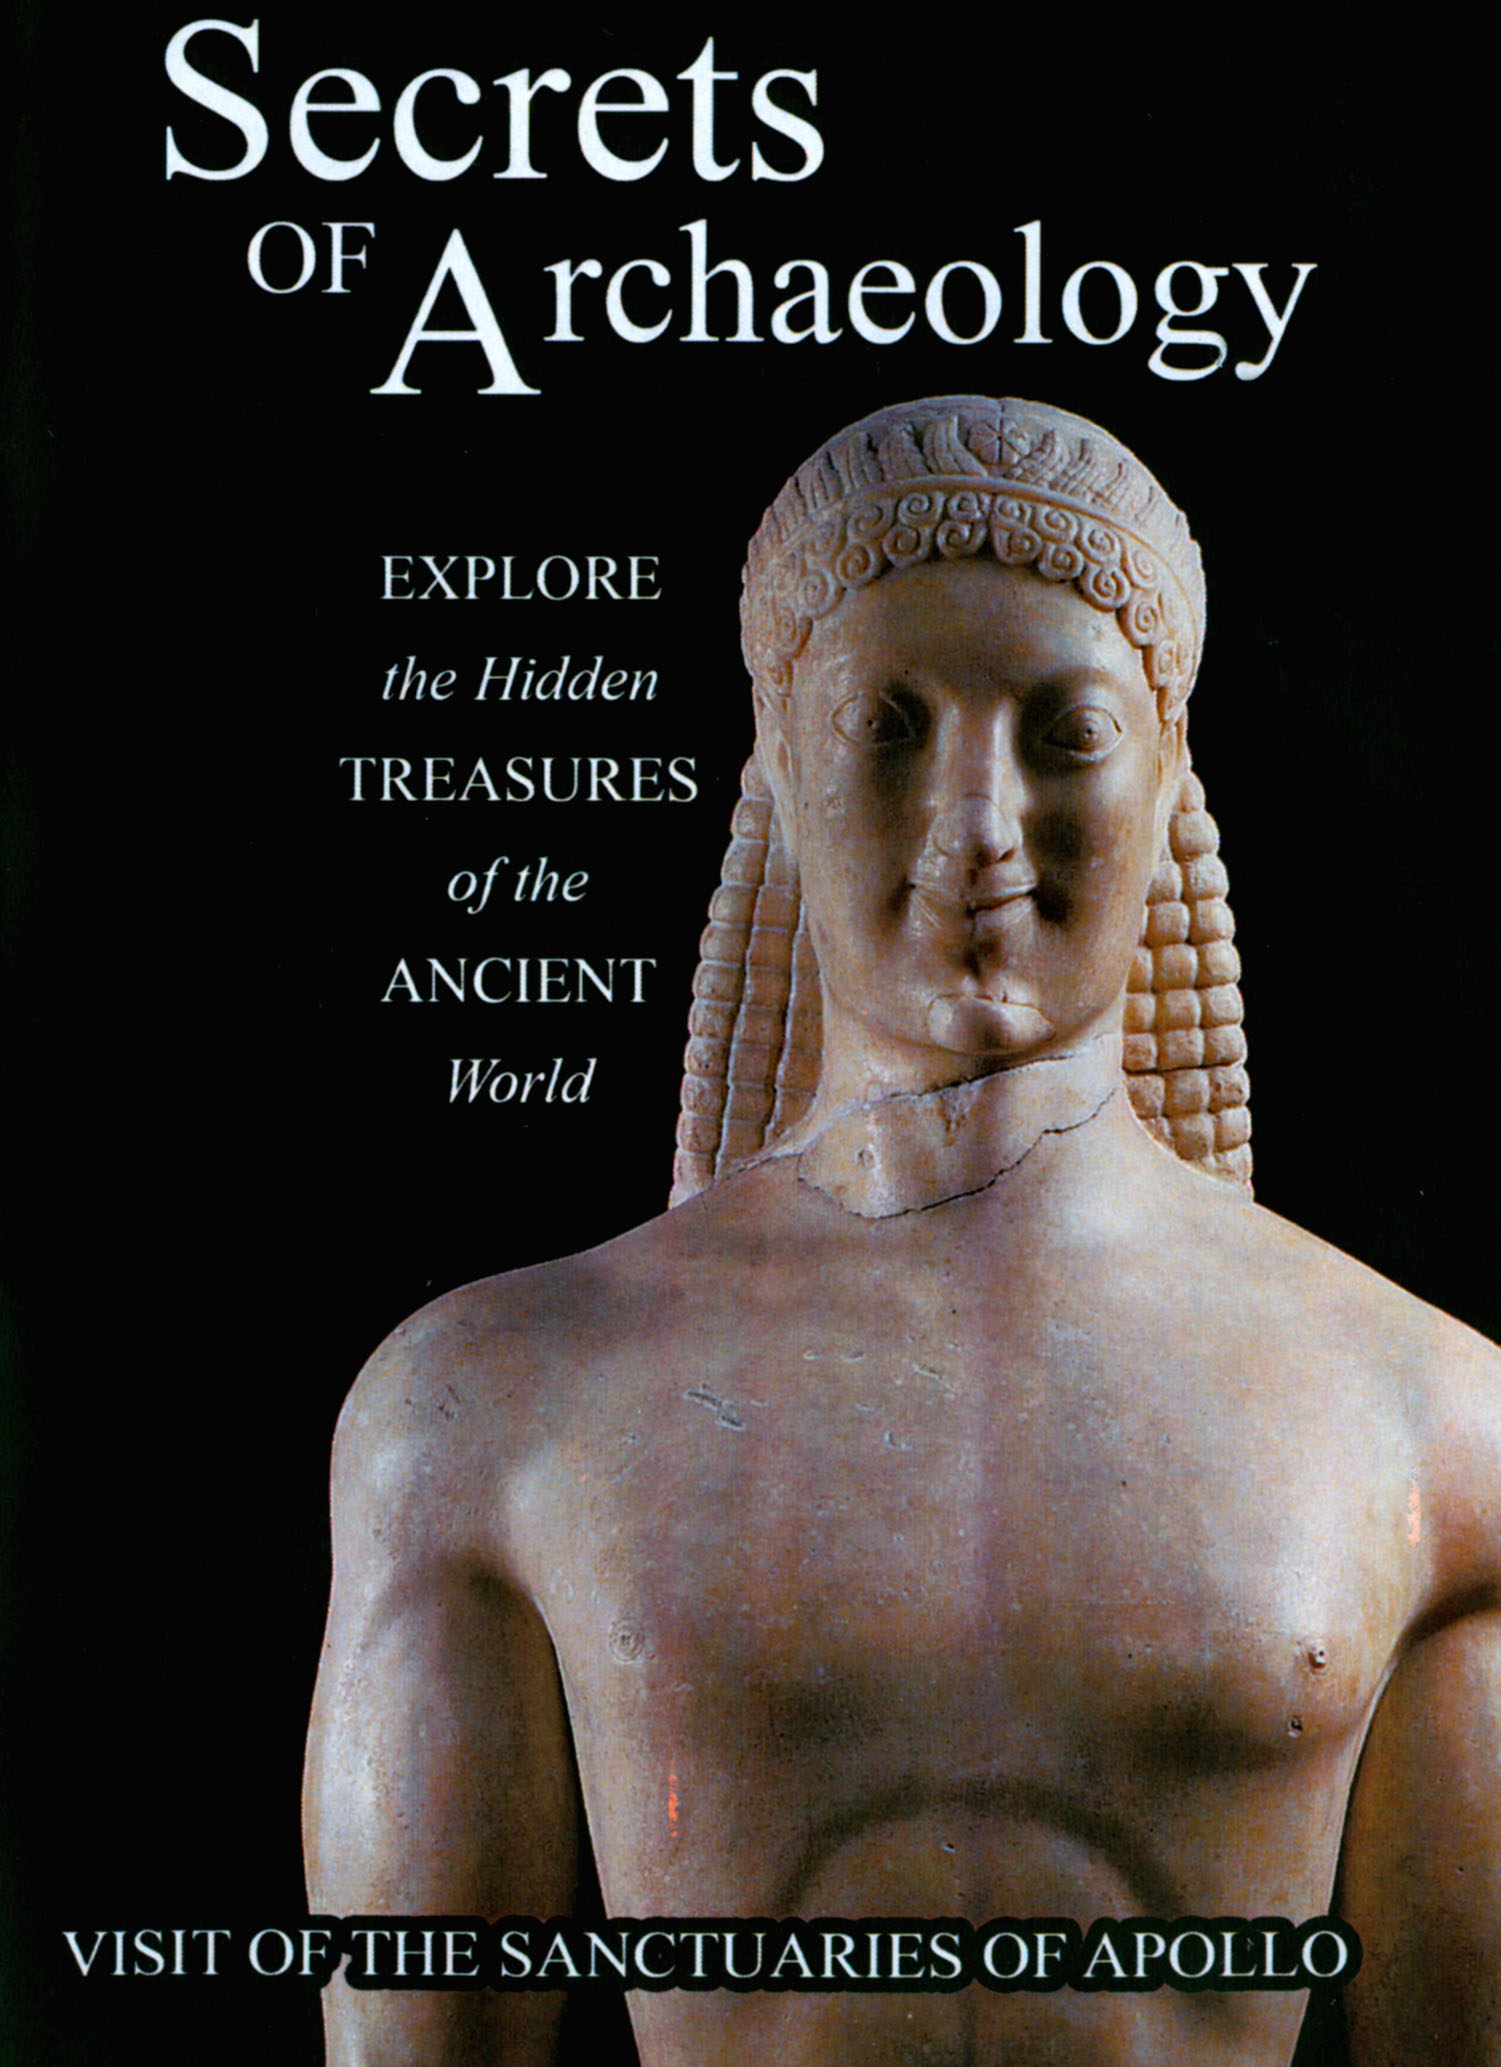 Secrets of Archaeology: The Sanctuaries of Apollo